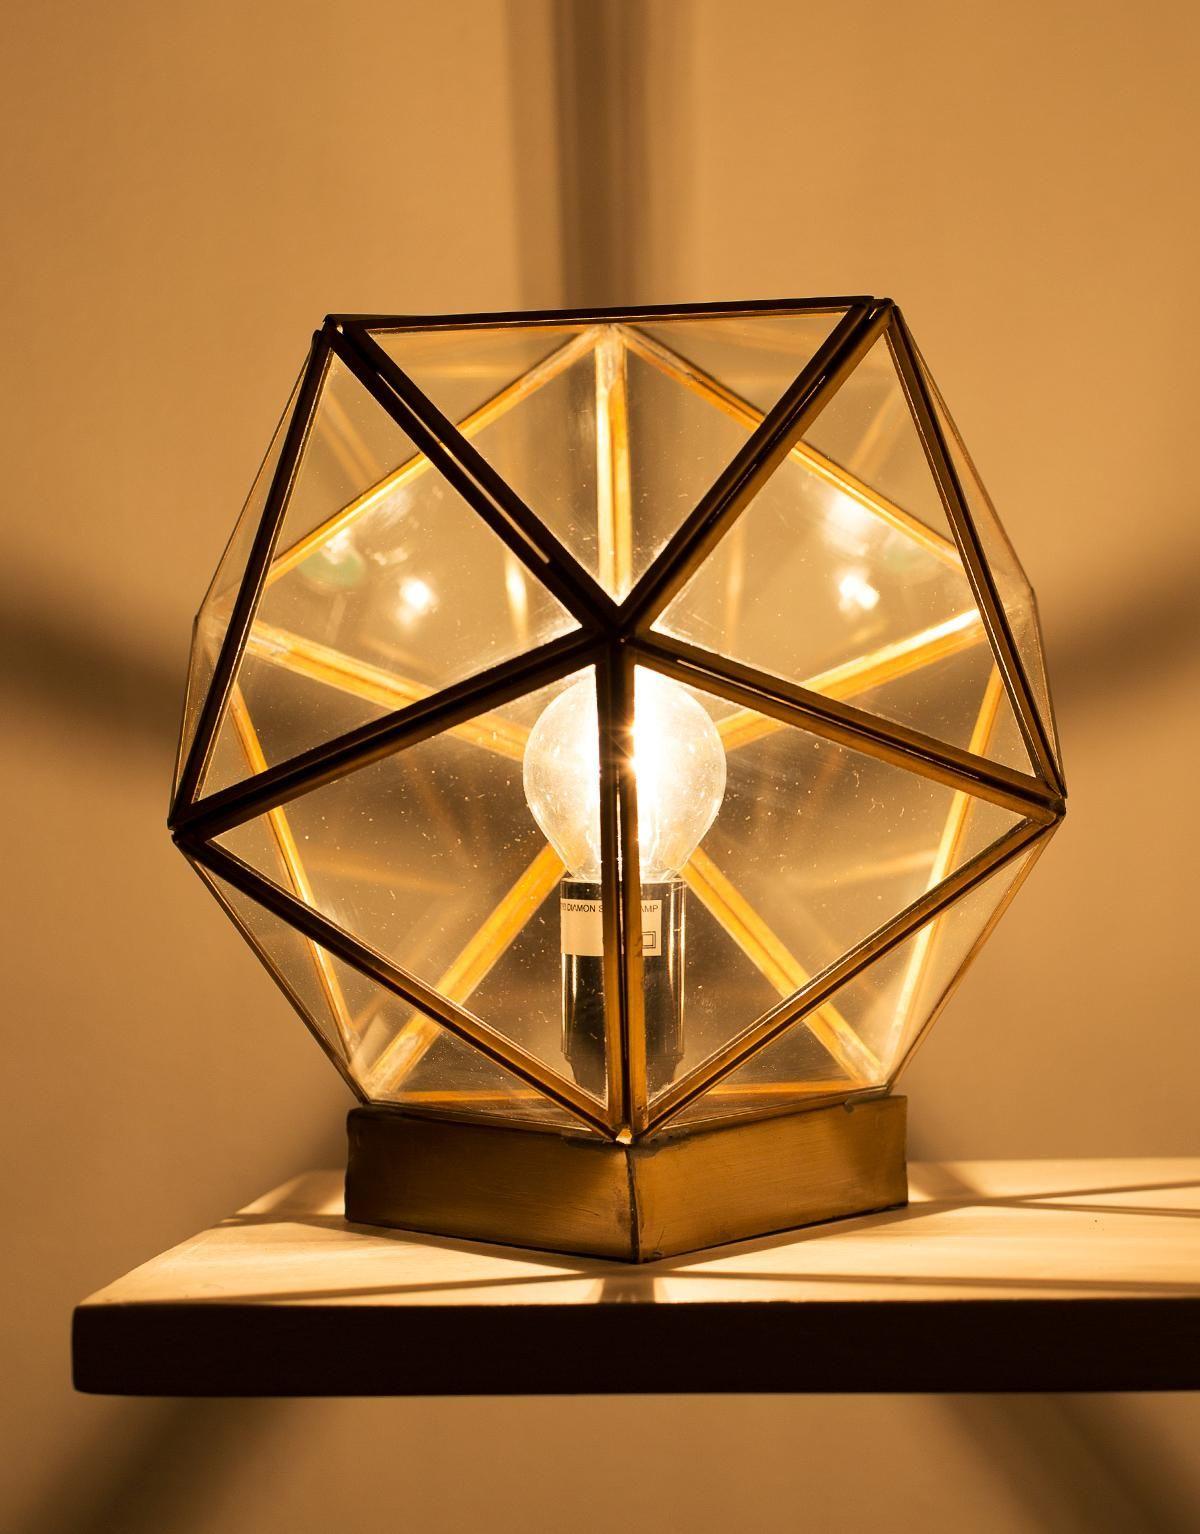 DIAMON bordslampa mässning | Interiør